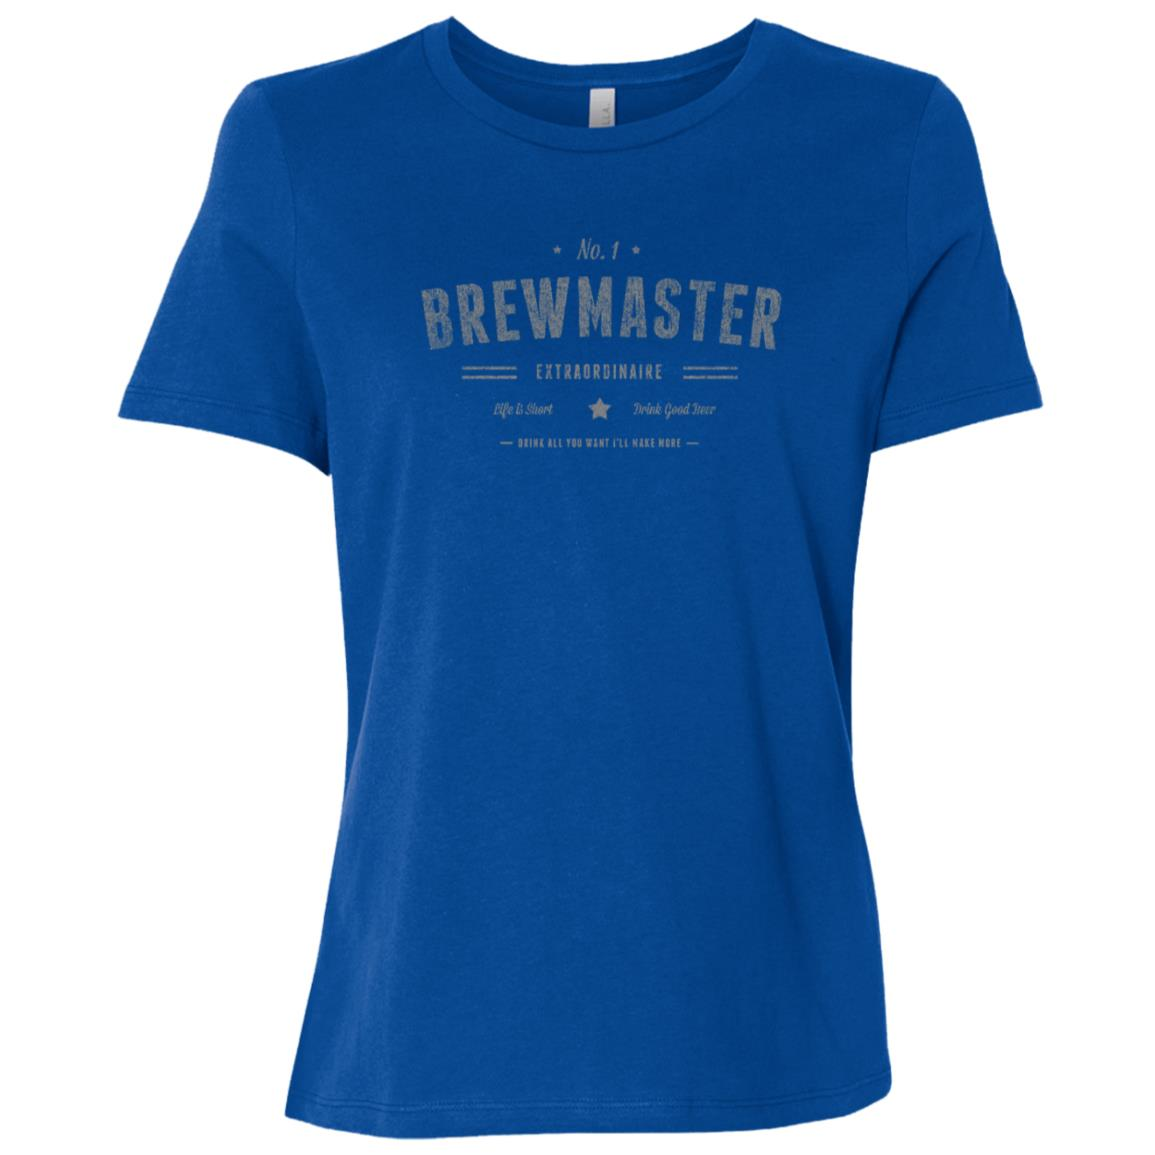 Brewmaster Extraordinaire Beer Brewing Women Short Sleeve T-Shirt